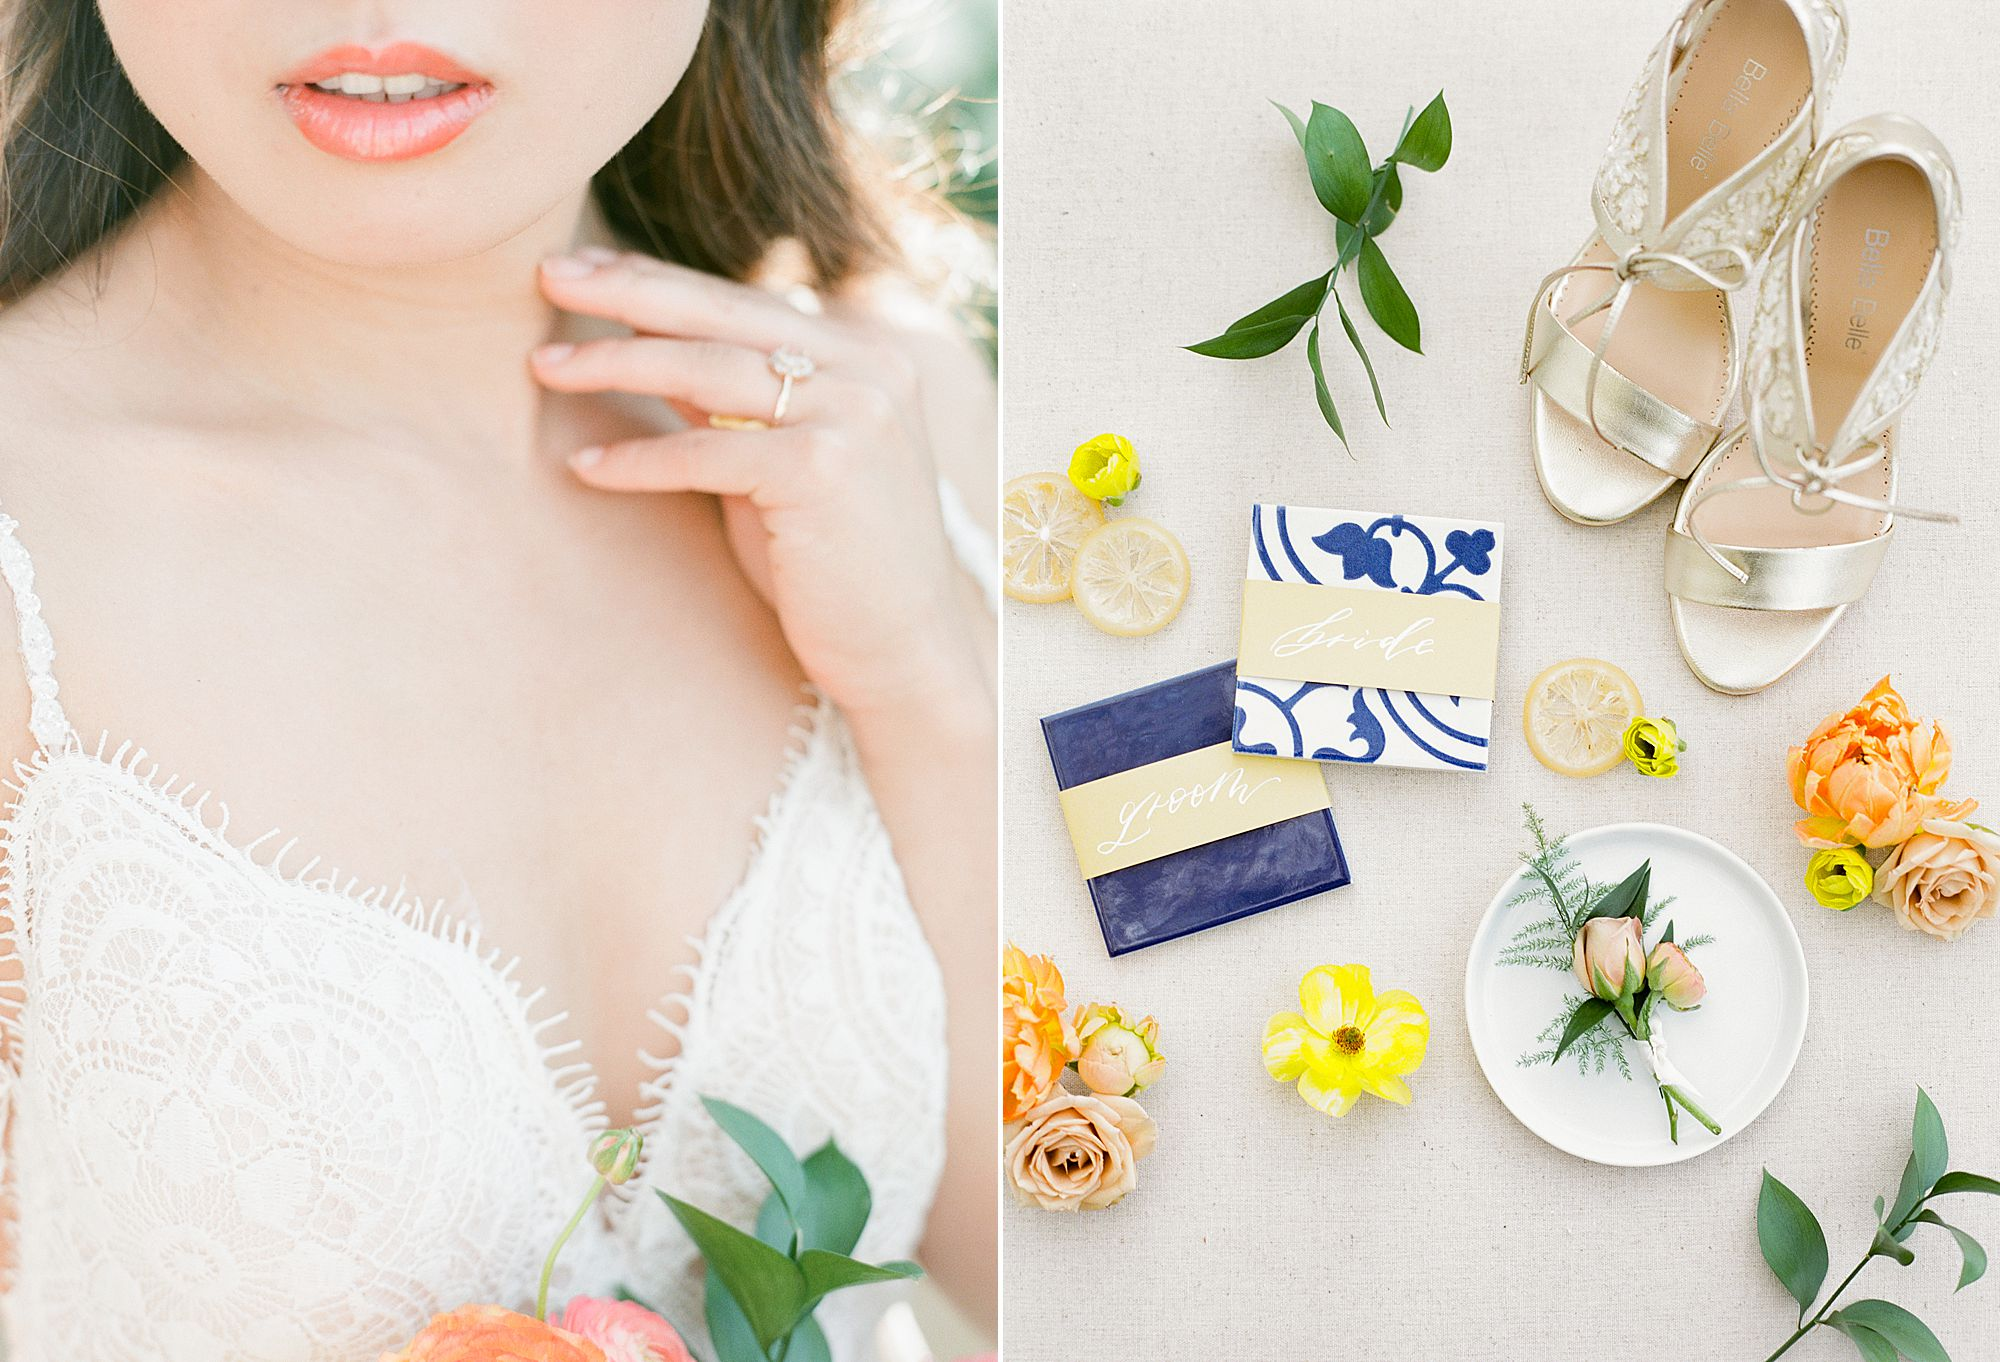 Italian Wedding Inspiration at The Maples Wedding & Event Center - Featured on Wedding Chicks - Ashley Baumgartner - Sacramento Wedding Phtoographer_0010.jpg